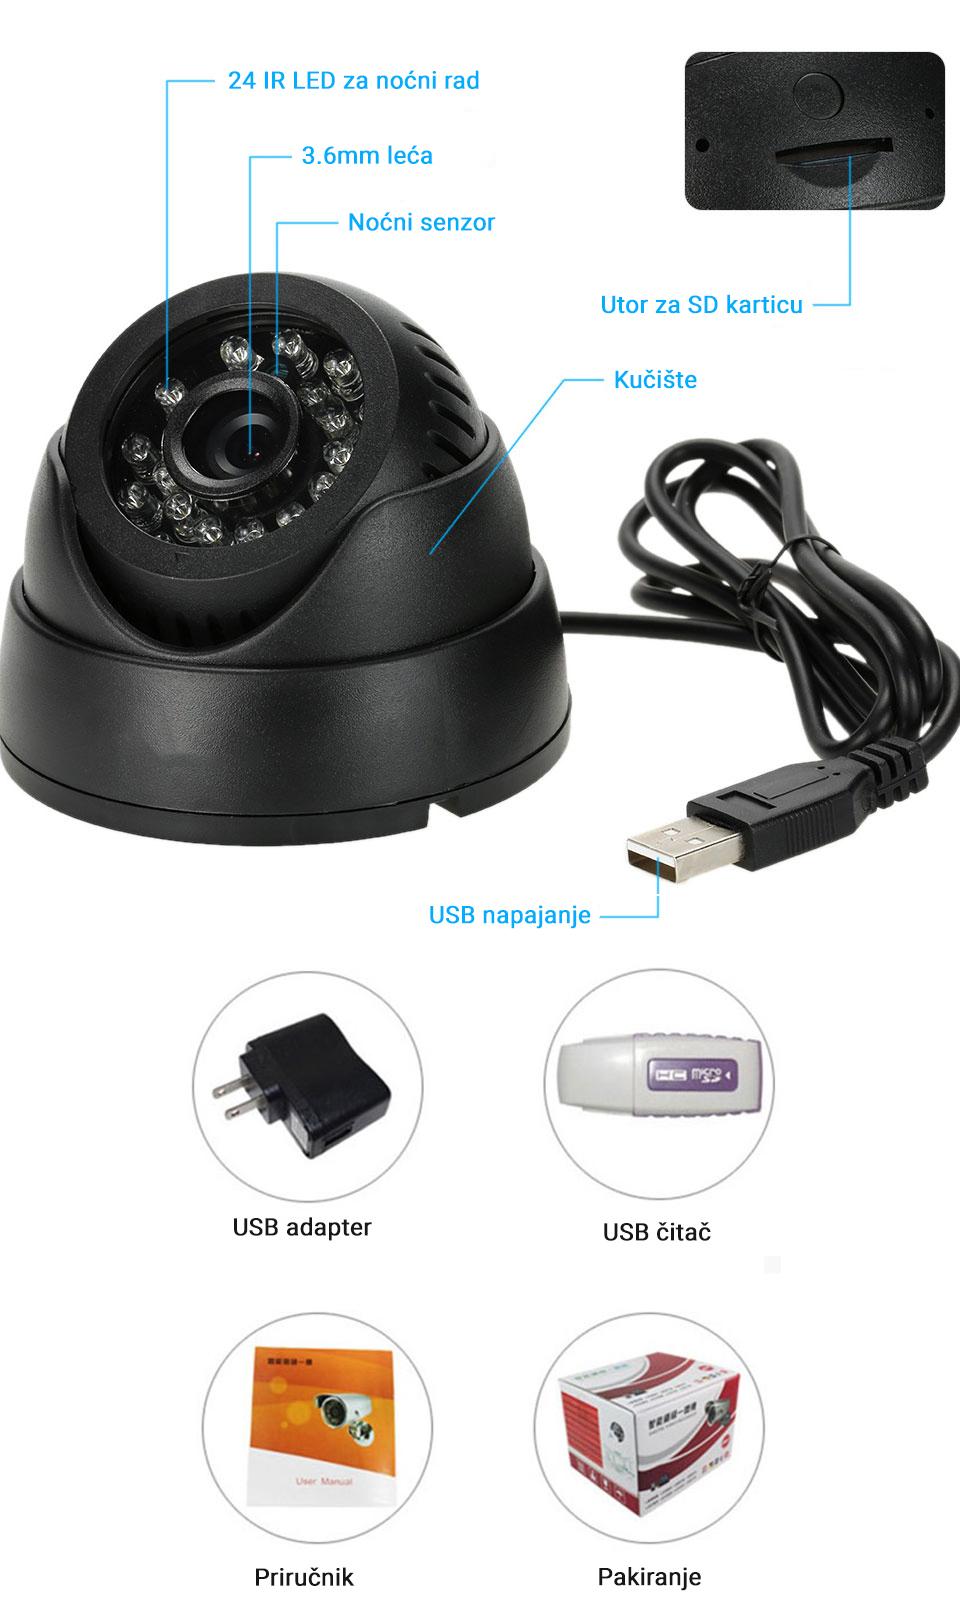 Nadzorna kamera Levco eCam-802 2